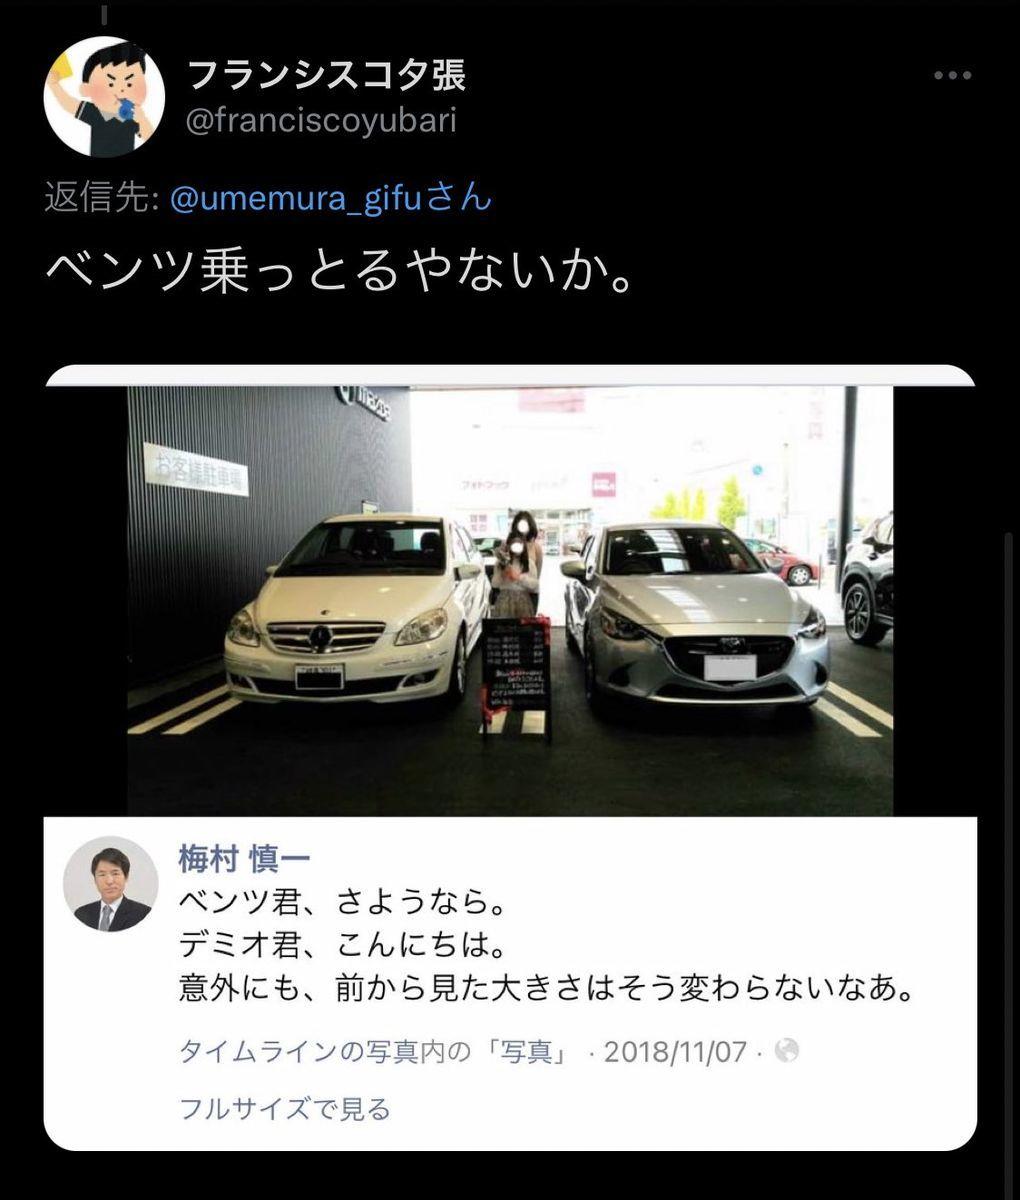 司法書士梅村慎一がベンツ購入。岸田総理33万円腕時計批判